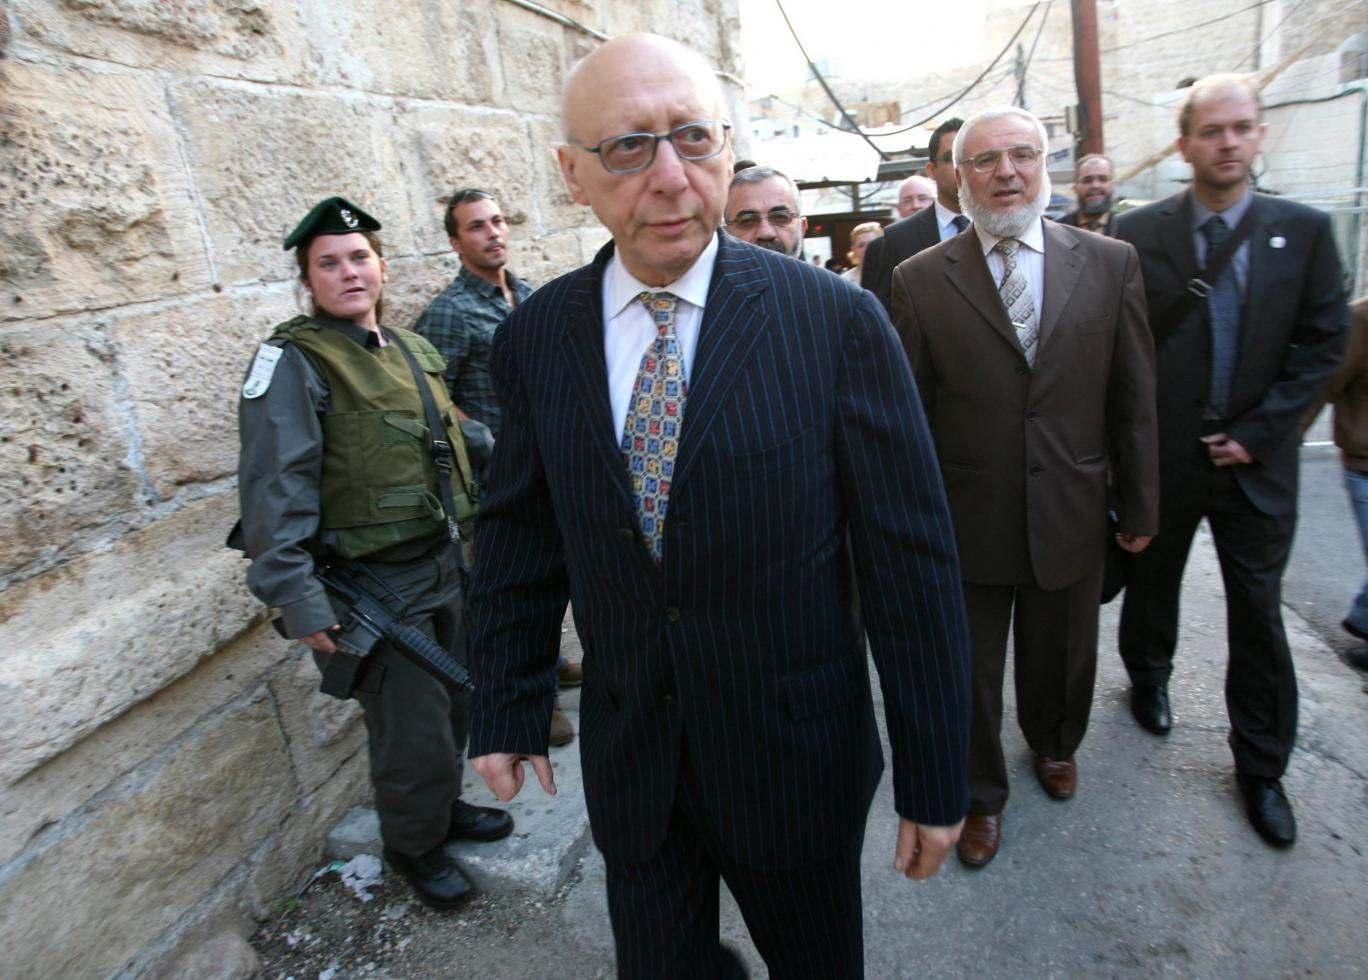 Gerald Kaufman MP on a visit to Israel in 2010 HAZEM BADER/AFP/Getty Images